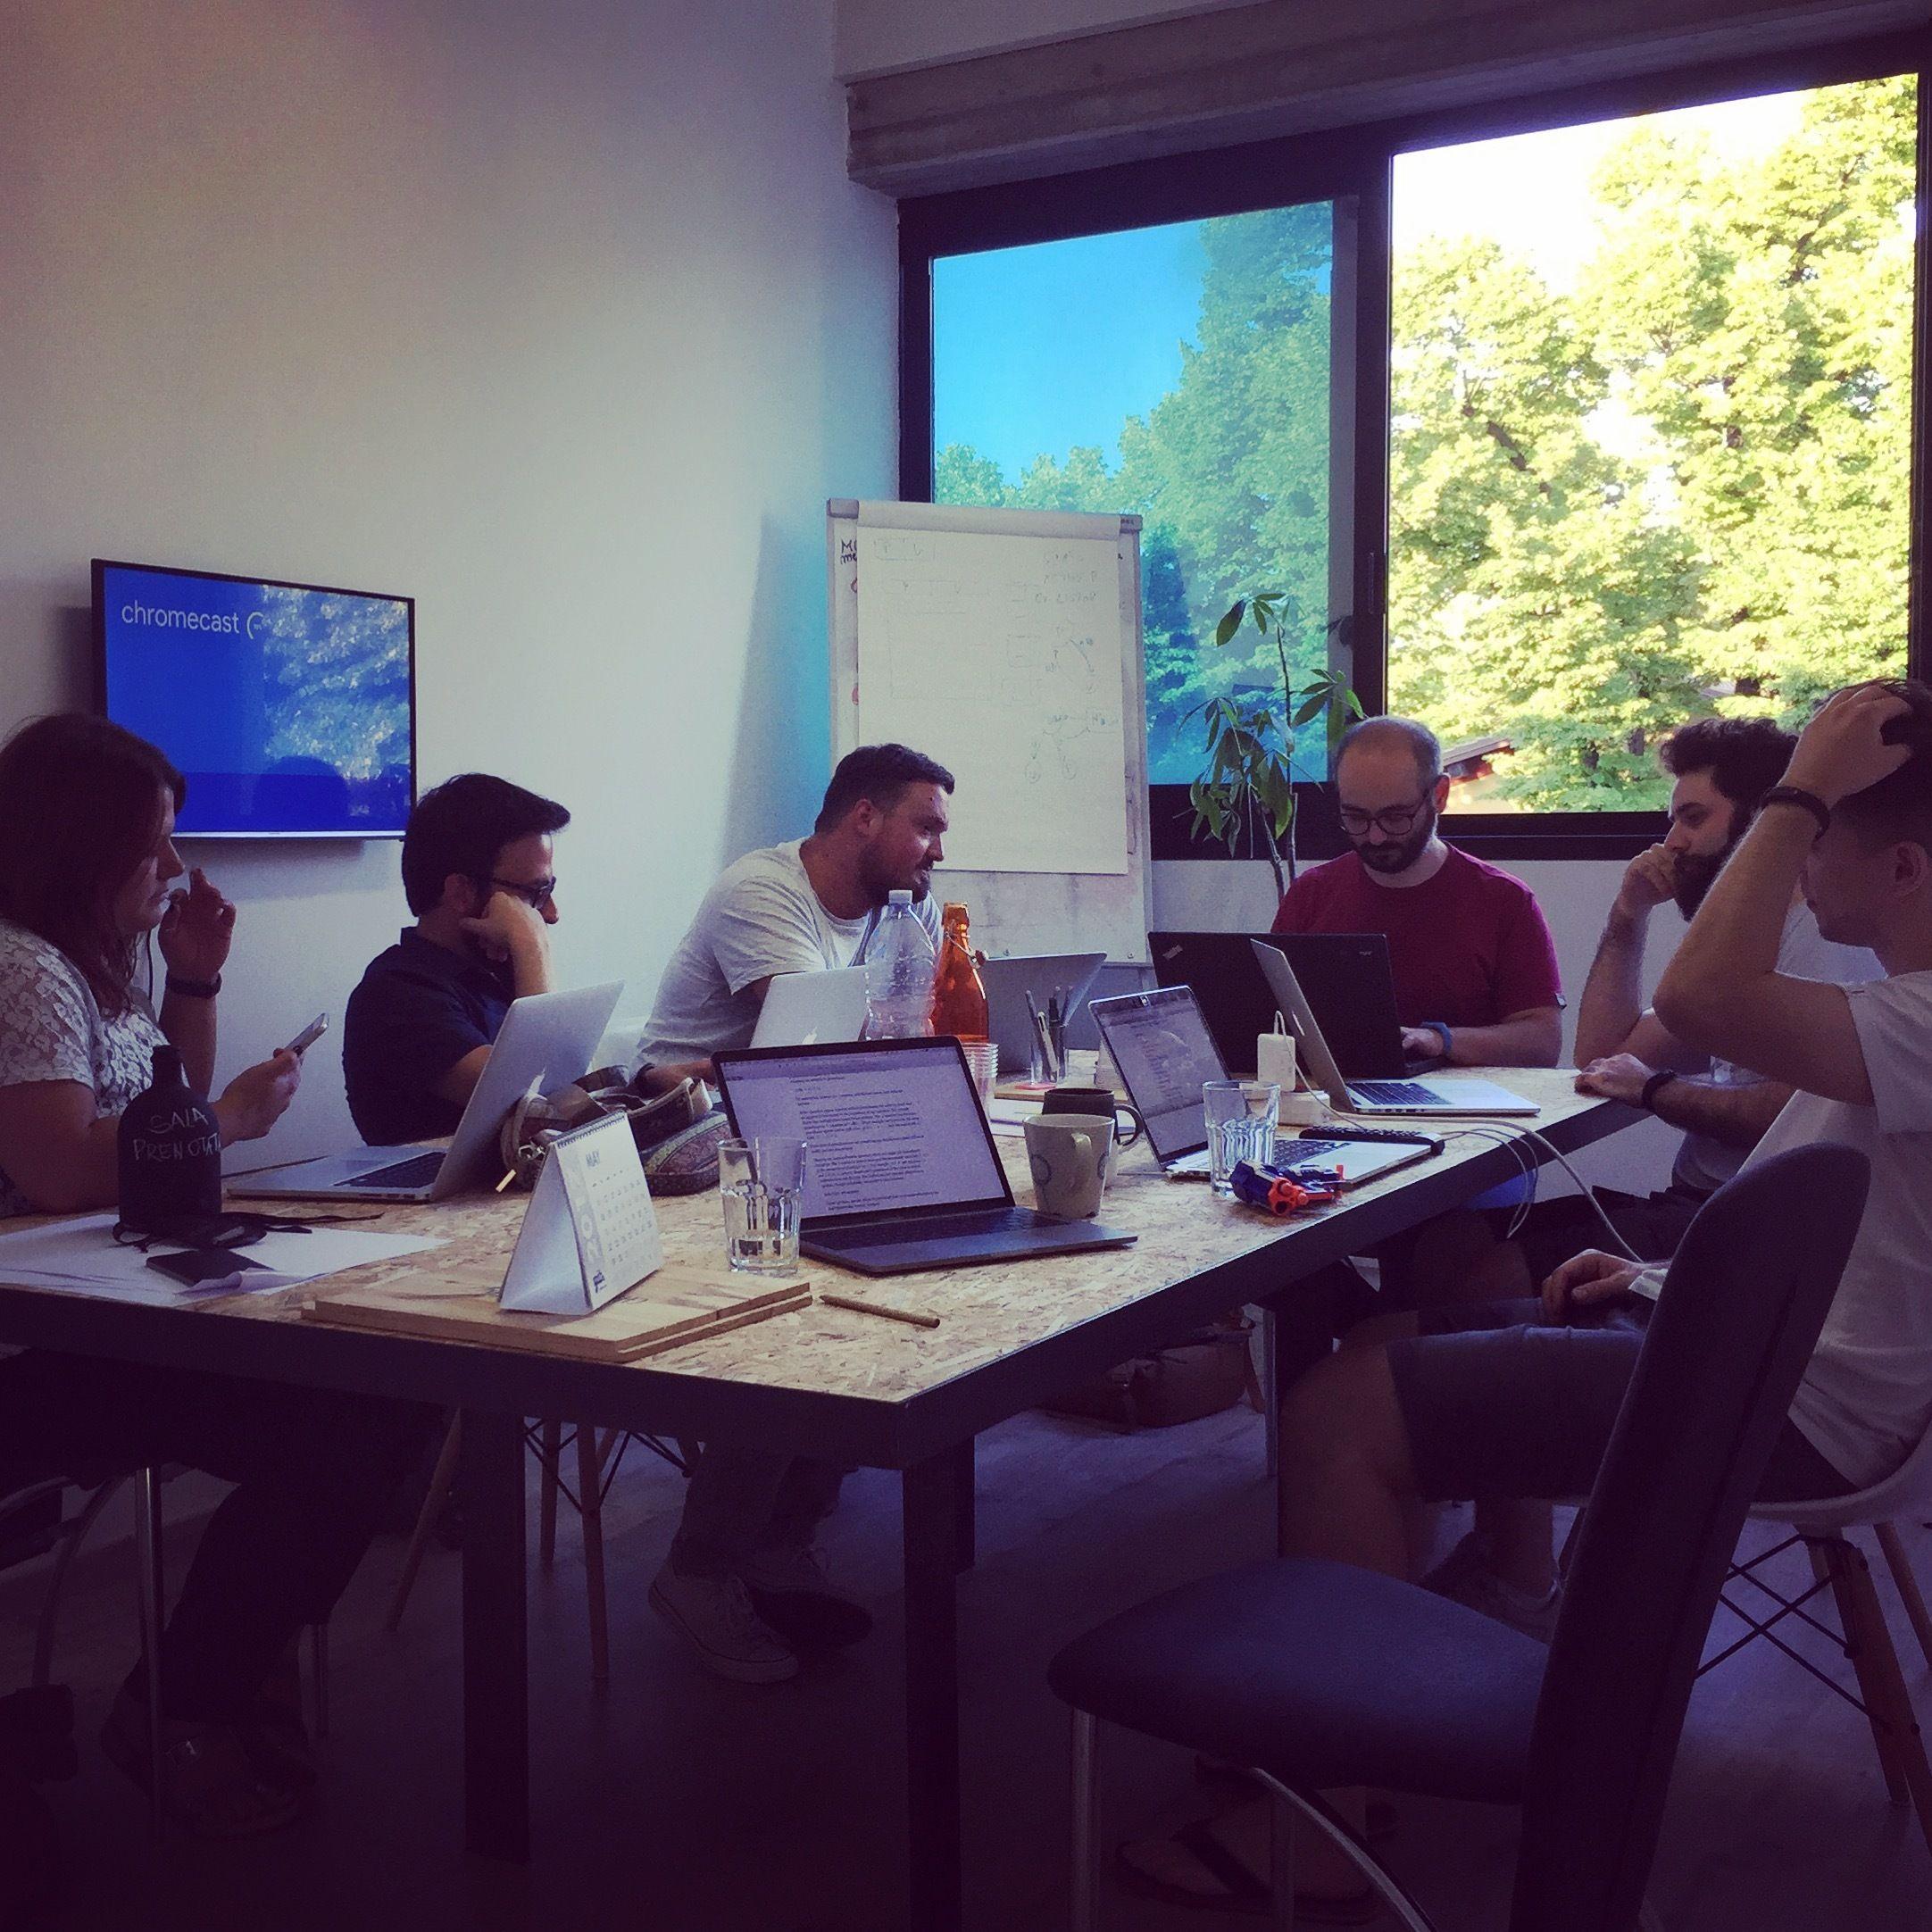 OpenTechSchool Romagna